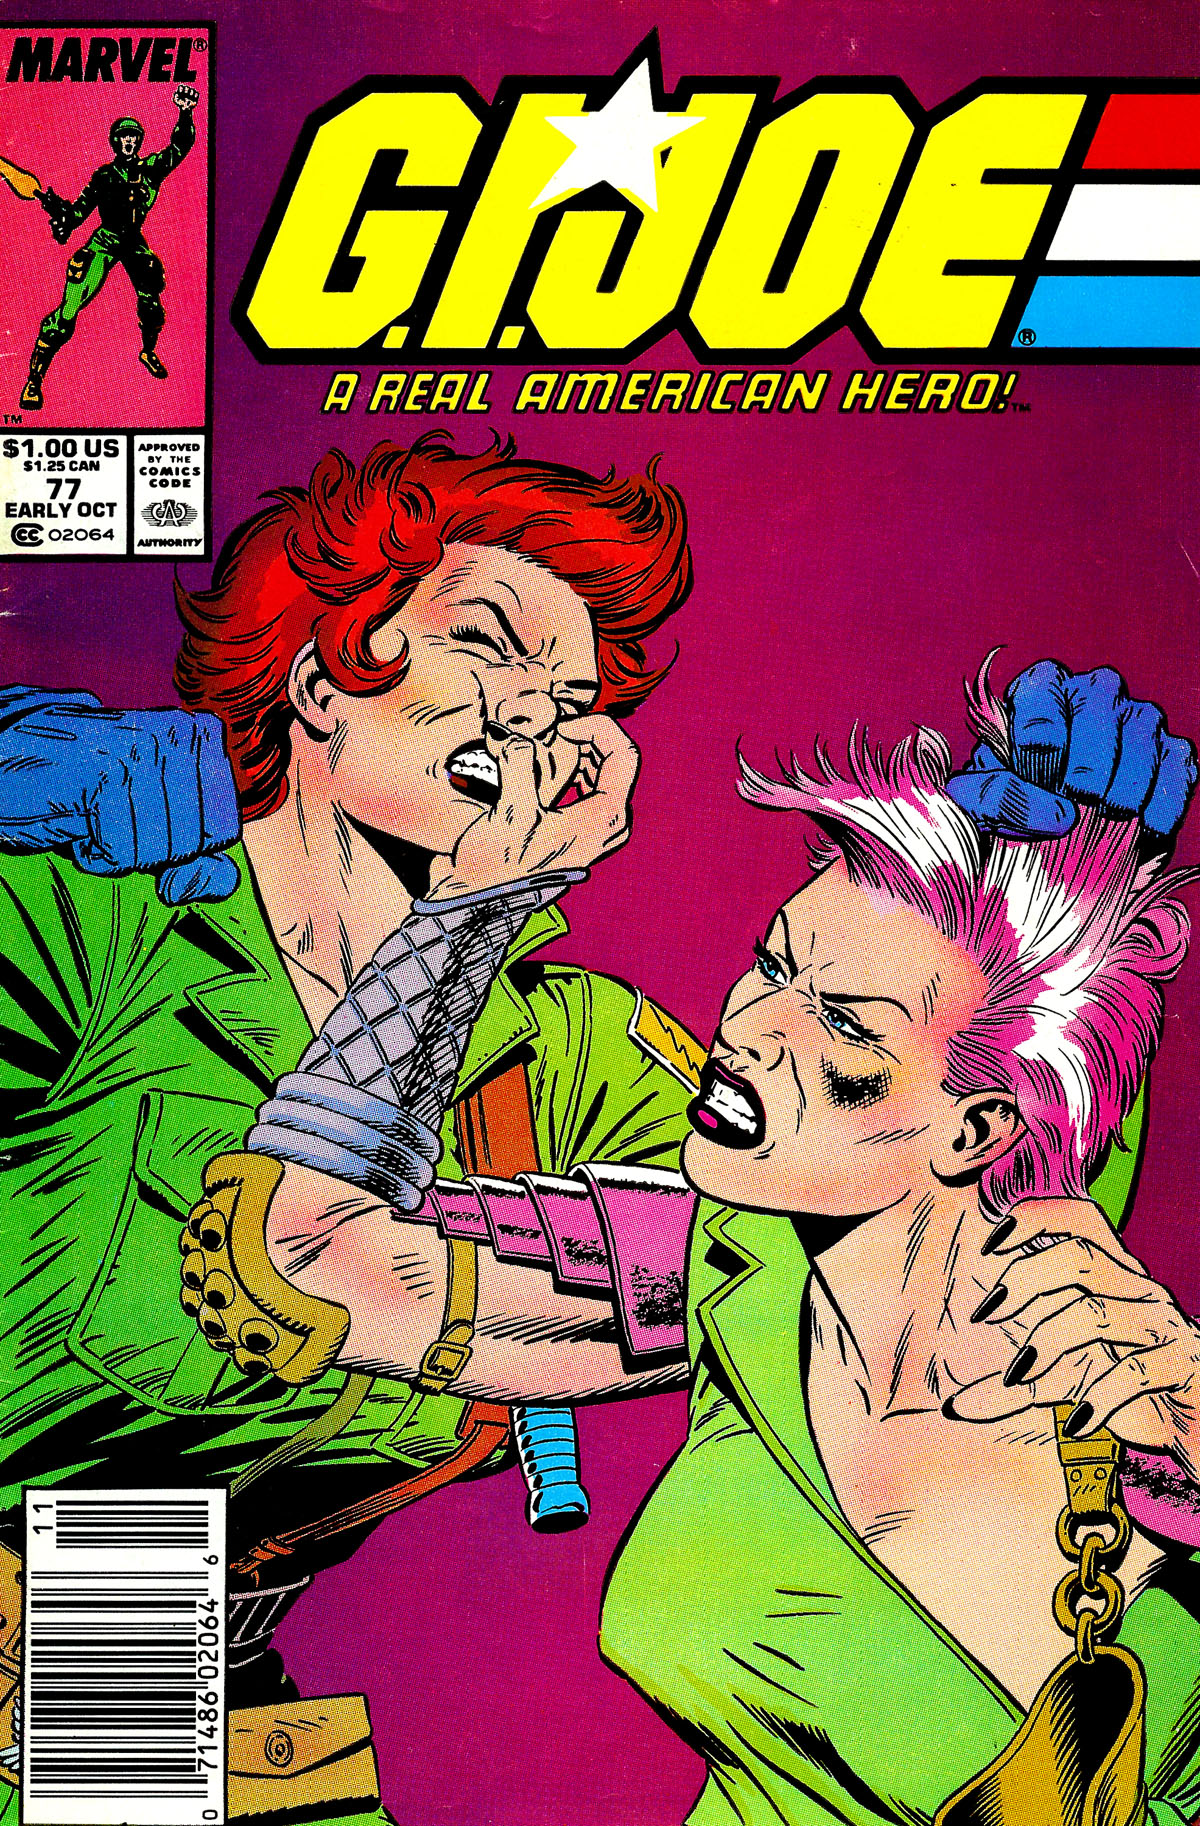 G.I. Joe: A Real American Hero 77 Page 1